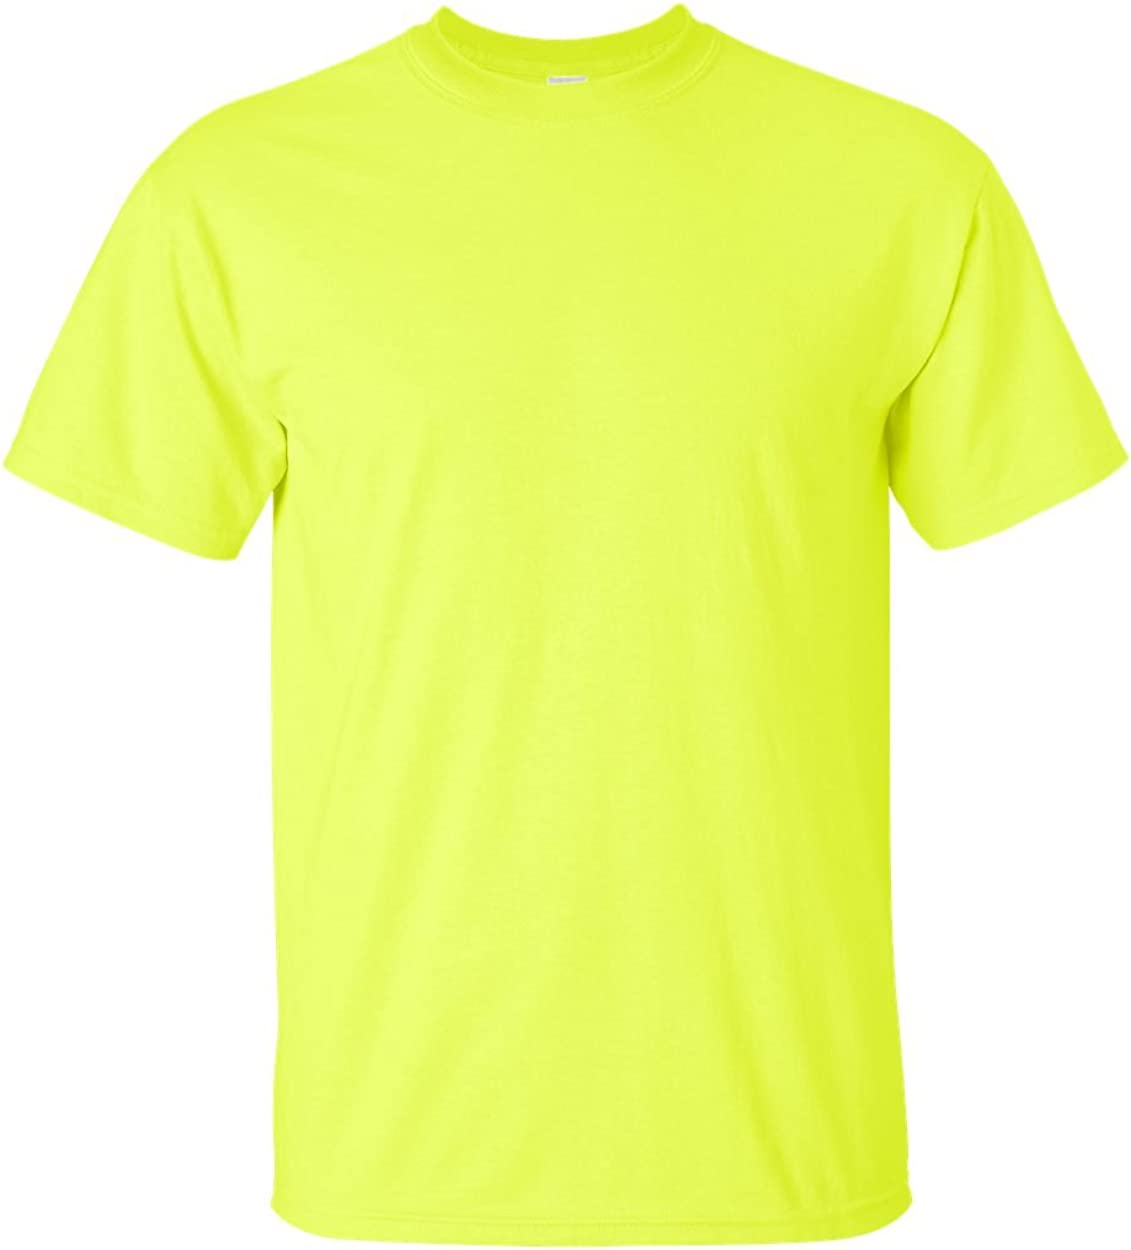 Gildan Men's Seamless Double Needle Preshrunk T-Shirt